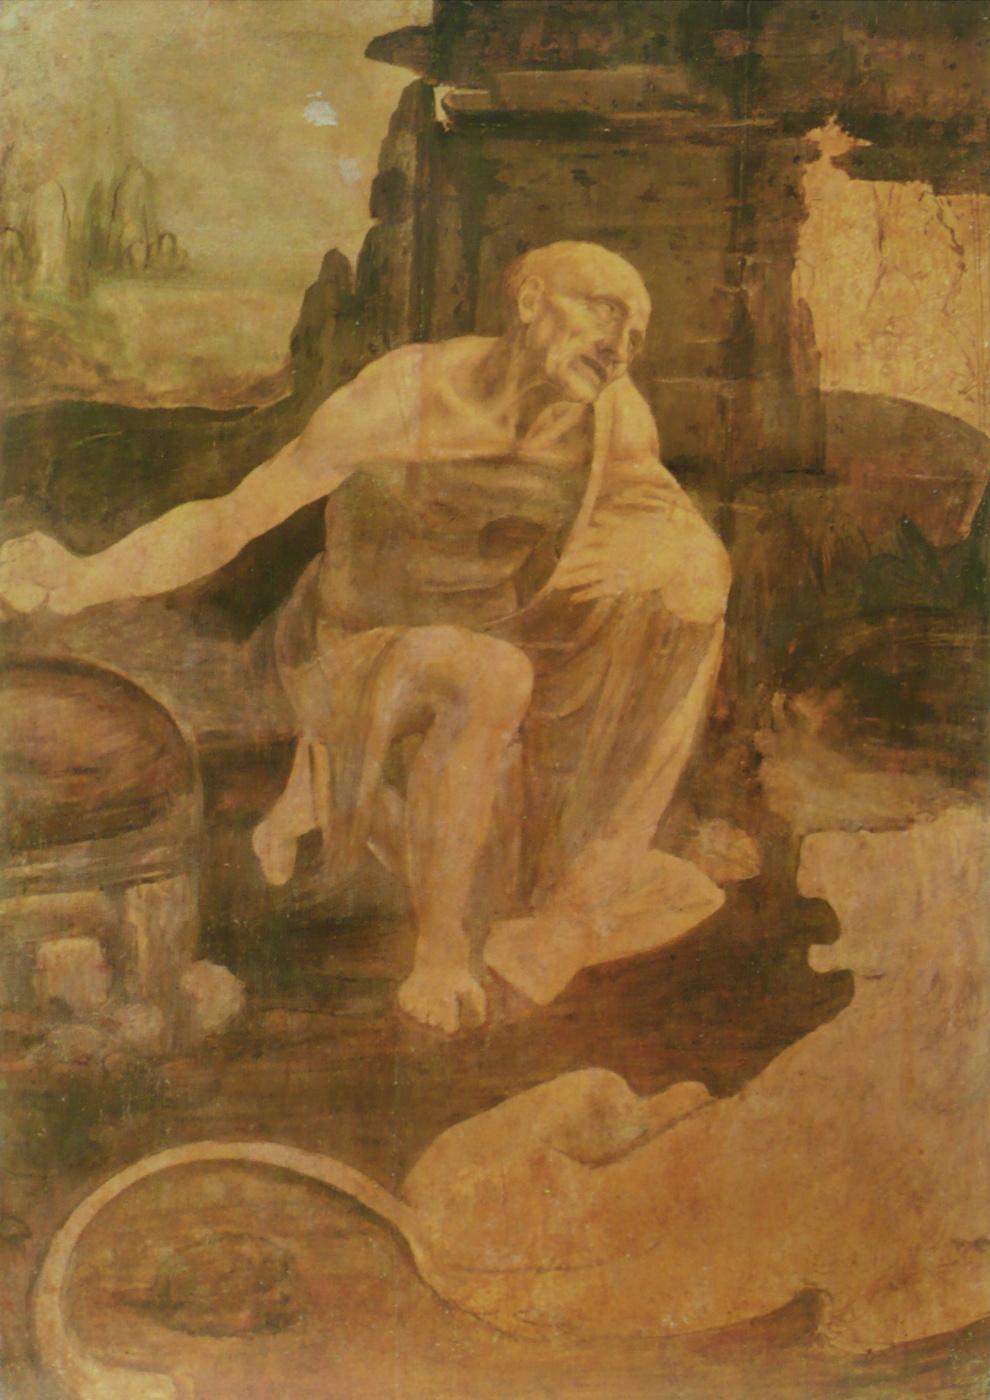 Leonardo da Vinci. Saint Jerome in the desert